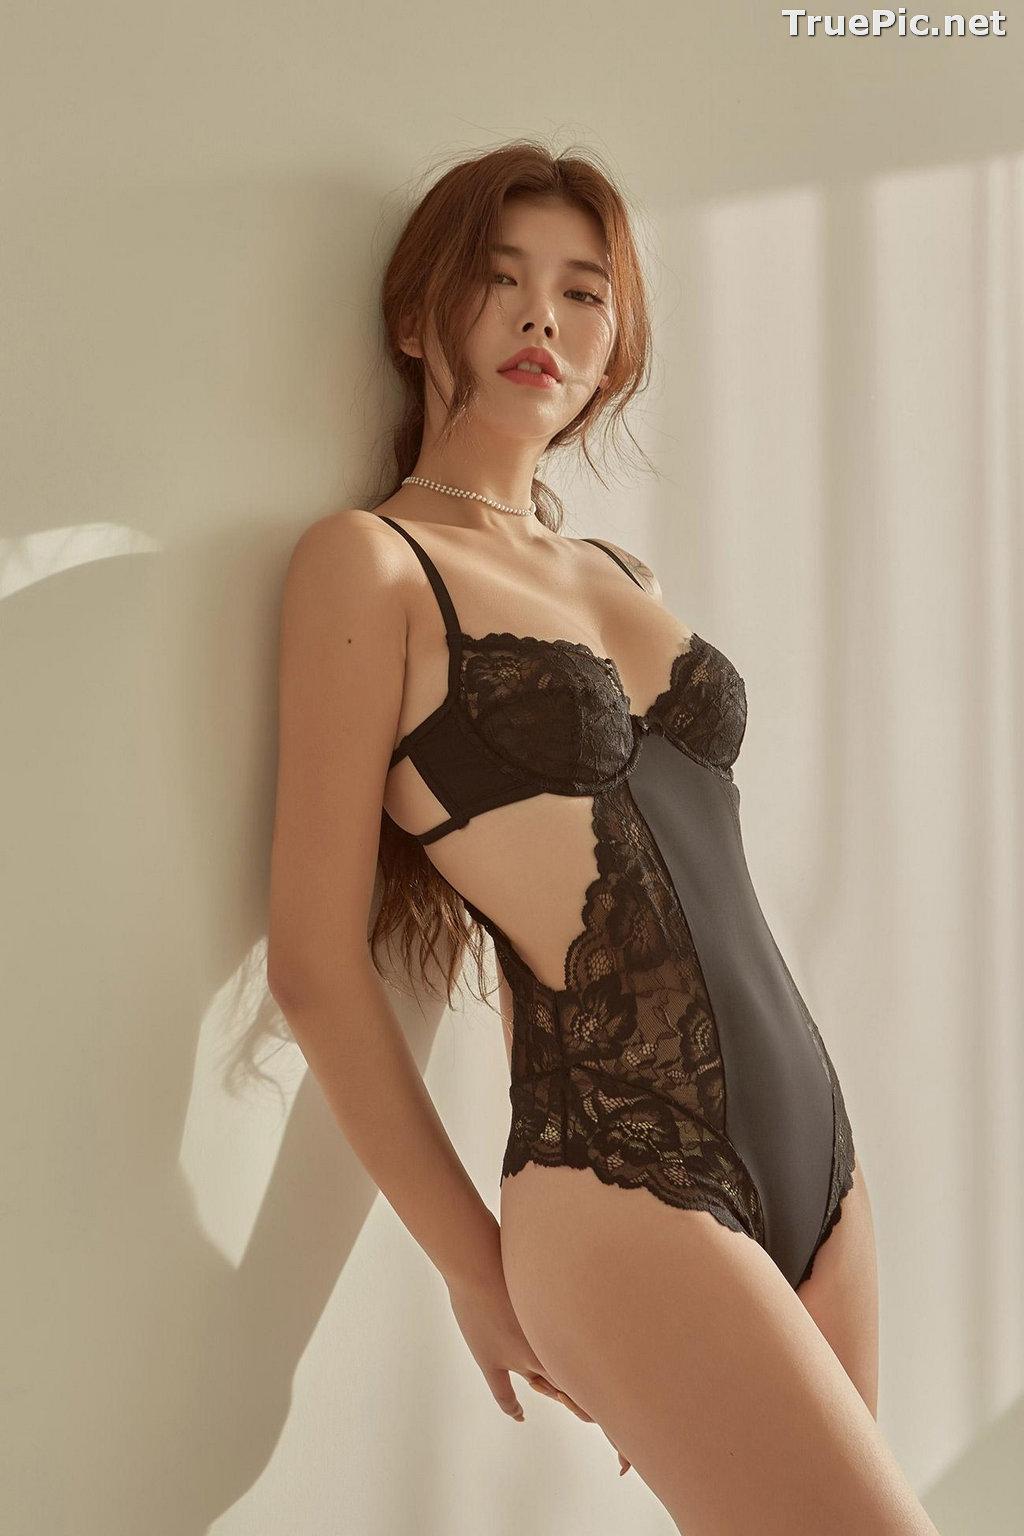 Image Korean Fashion Model - Da Yomi (다요미) - Lountess Spring Lingerie #1 - TruePic.net - Picture-6